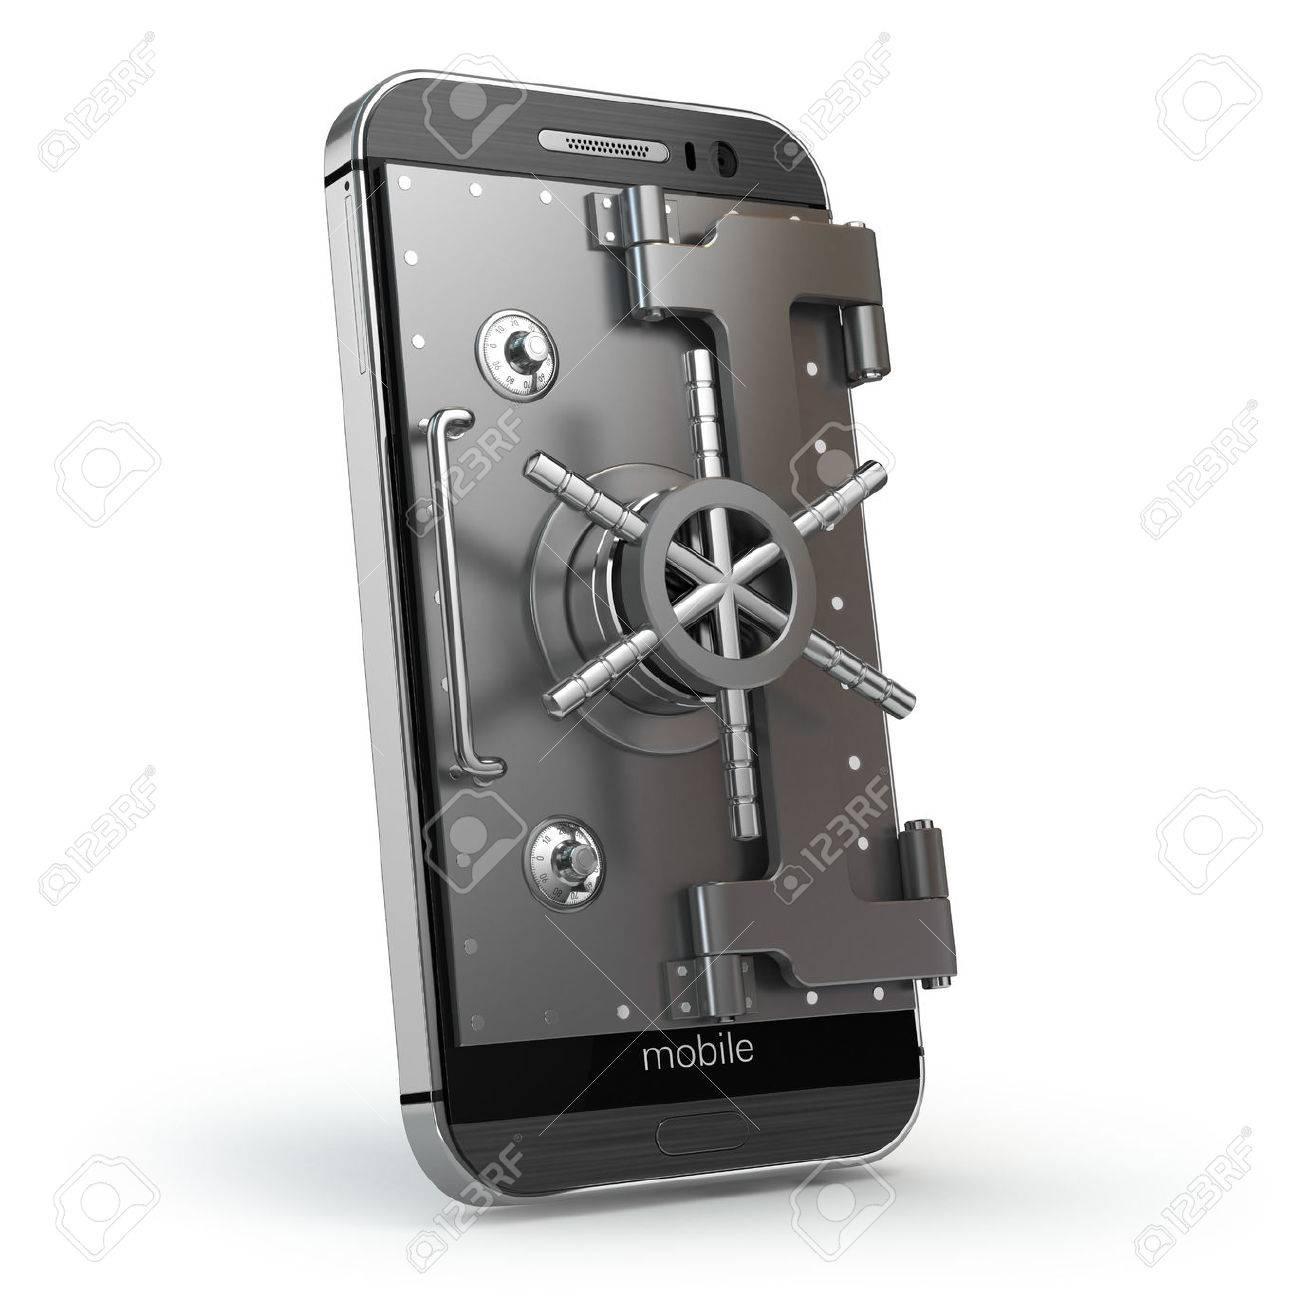 Cell phone vault